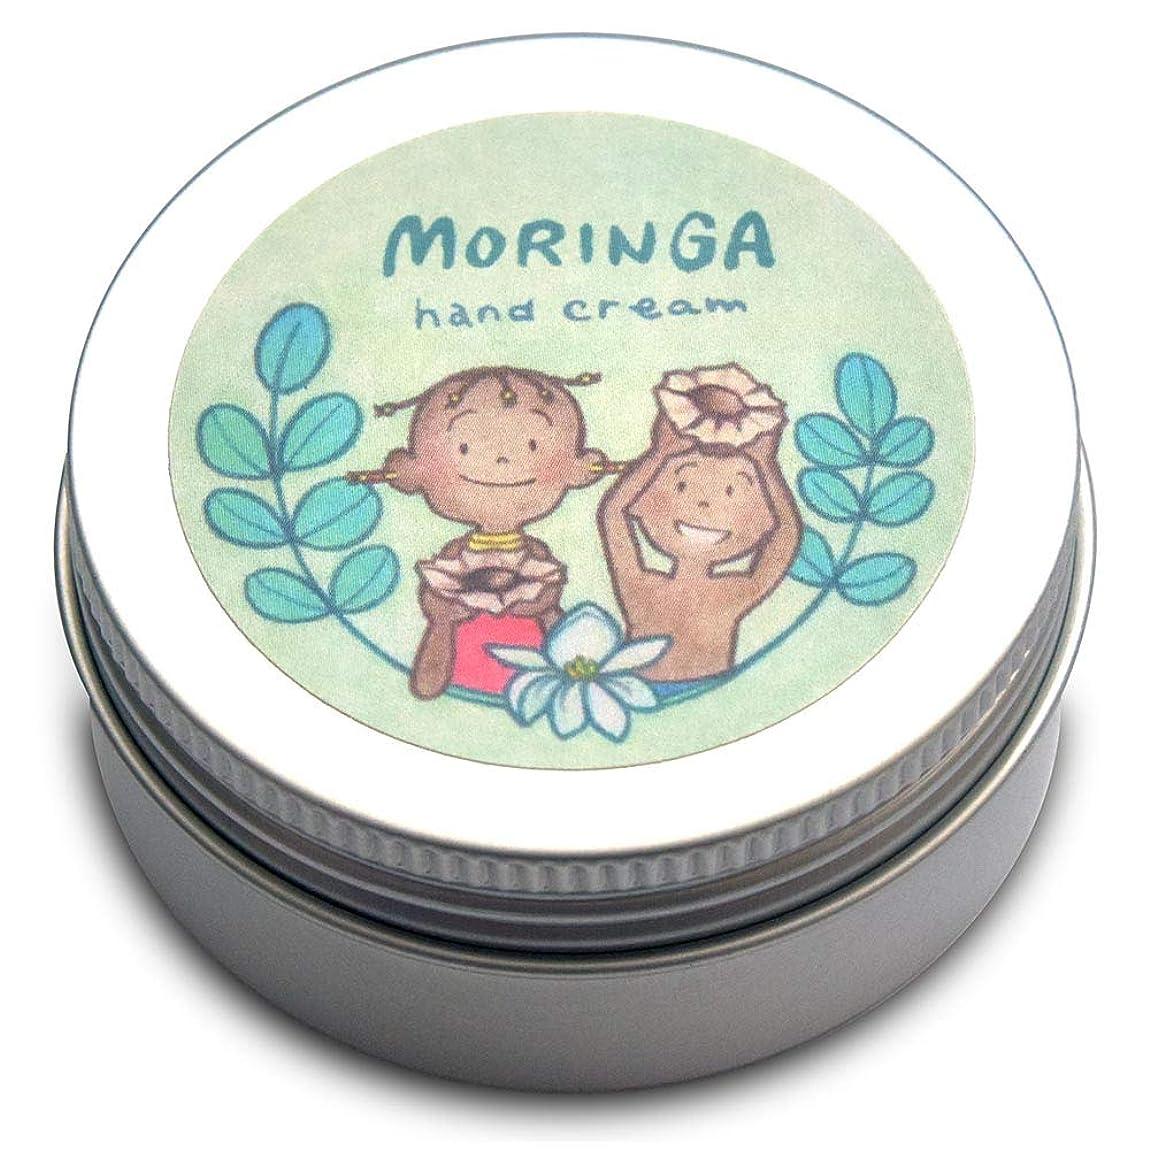 MORINGA モリンガハンドクリーム 30g